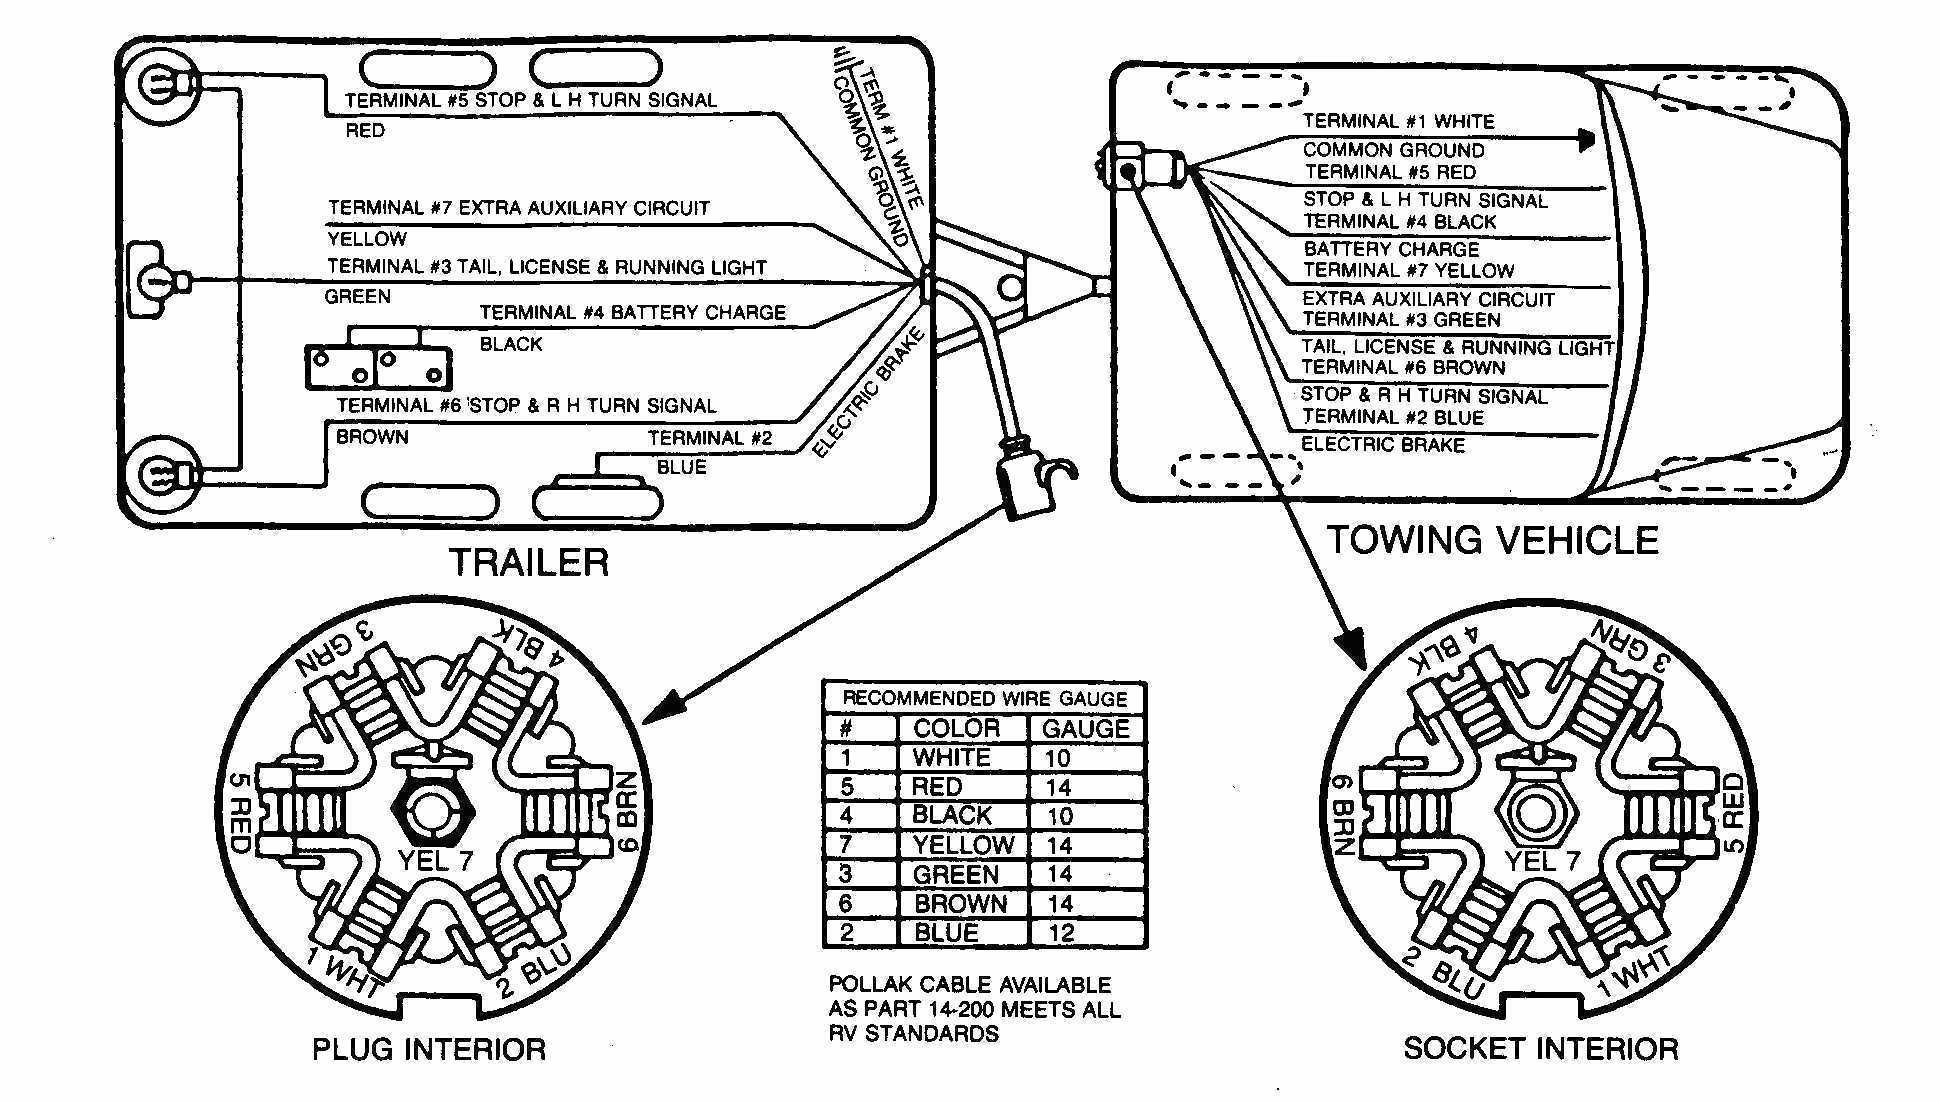 7 Pin Trailer Plug Wiring Diagram - Waidaigou - 7 Way Trailer Plug Wiring Diagram Ford